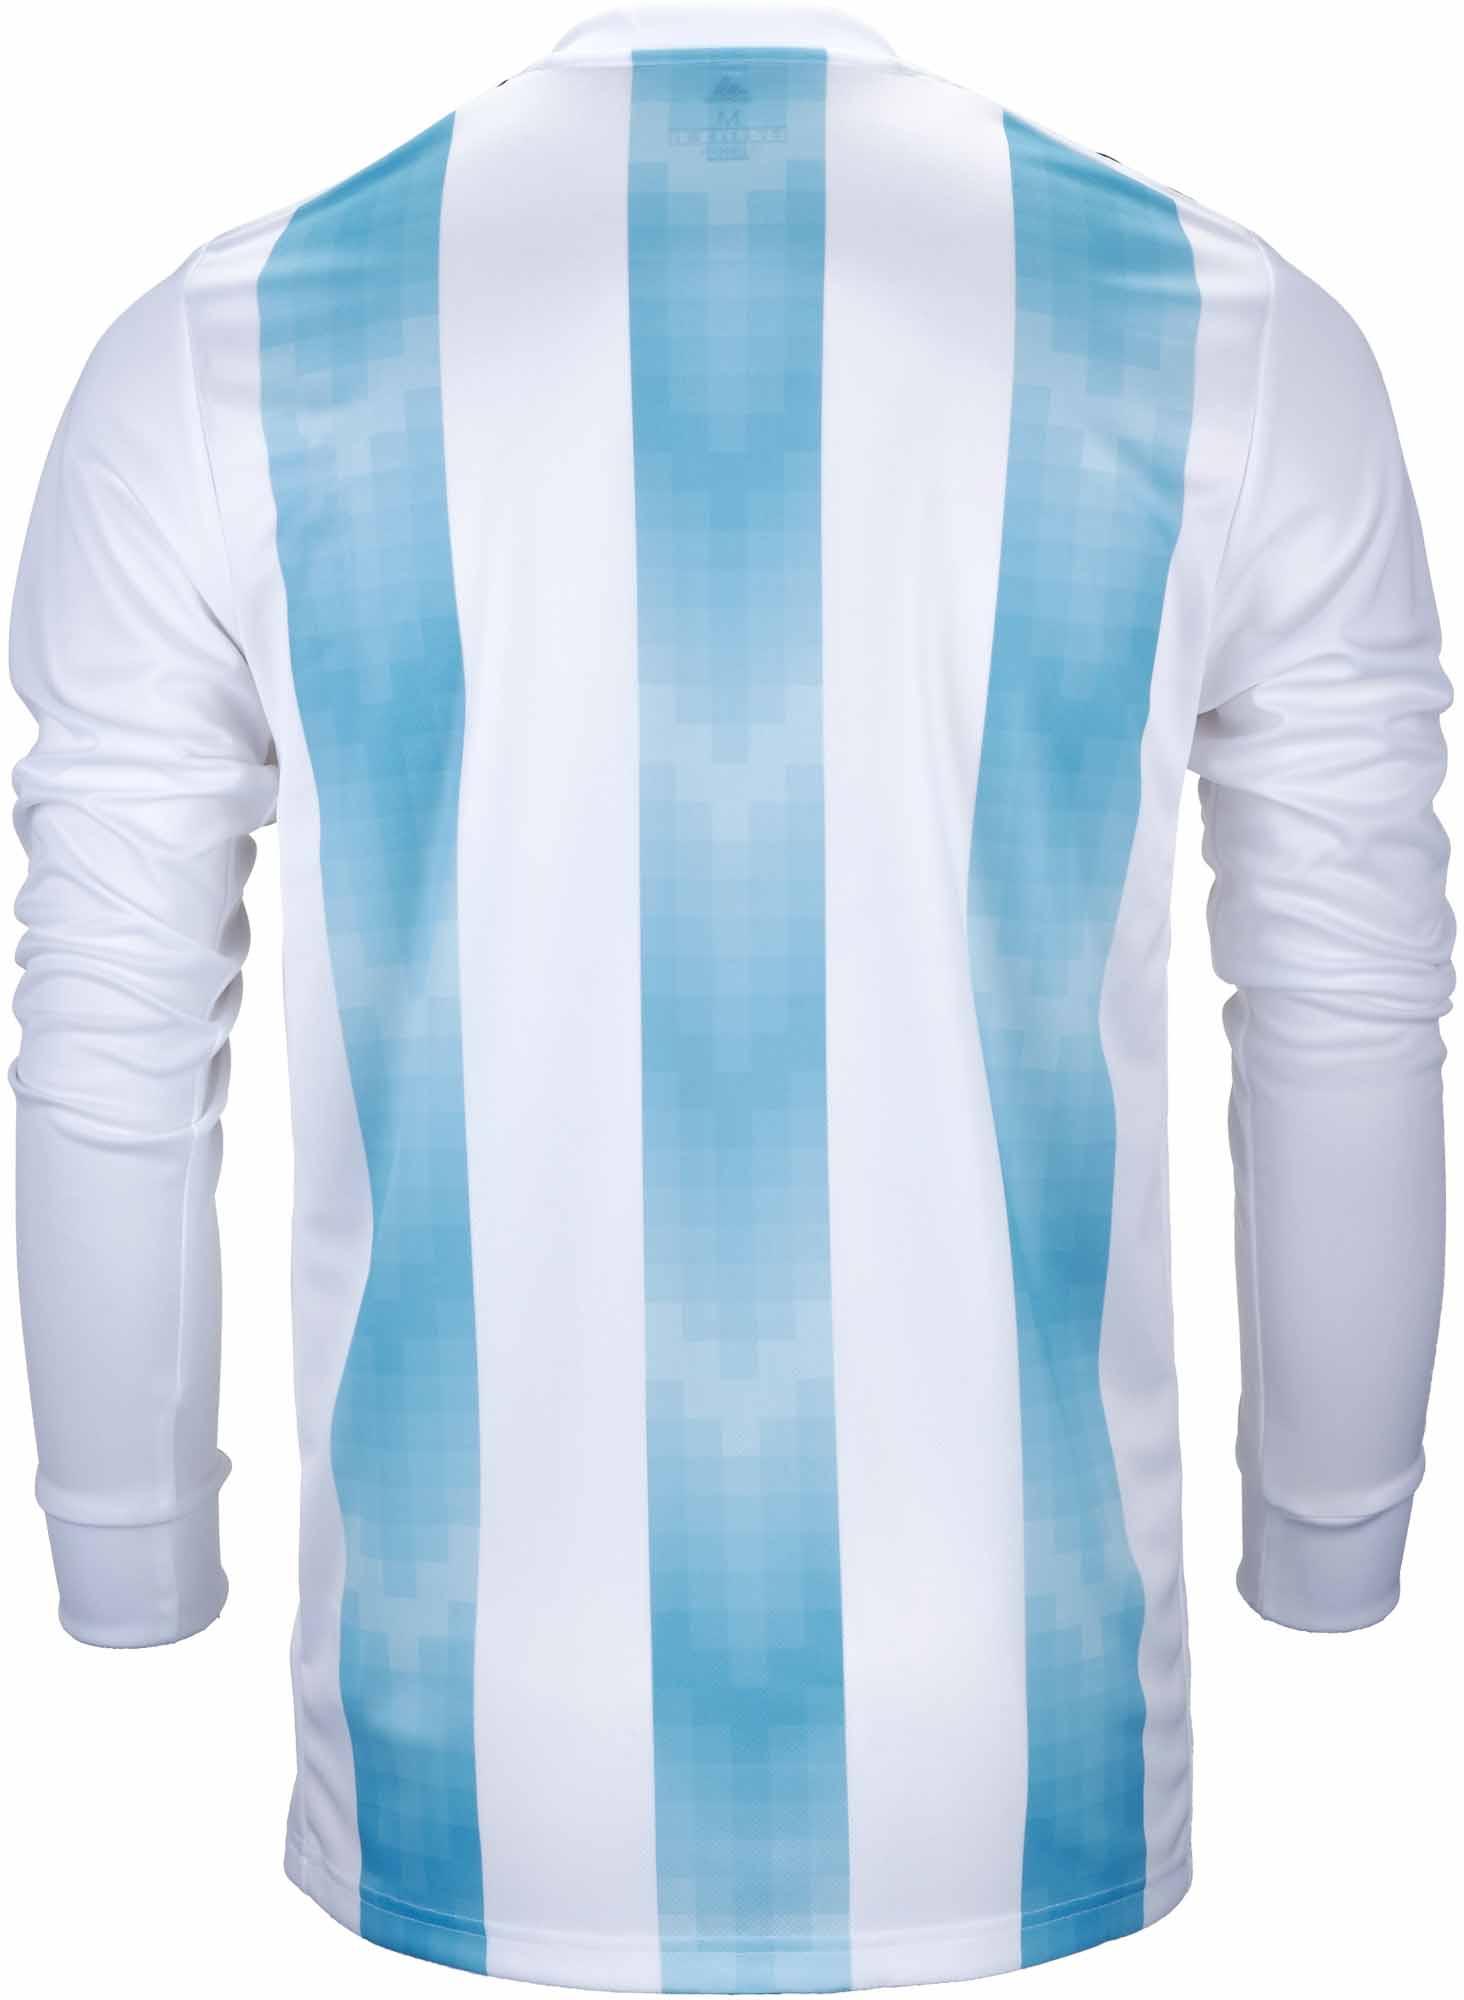 b21fd0fae79 adidas Argentina L S Home Jersey 2018-19- SoccerPro.com